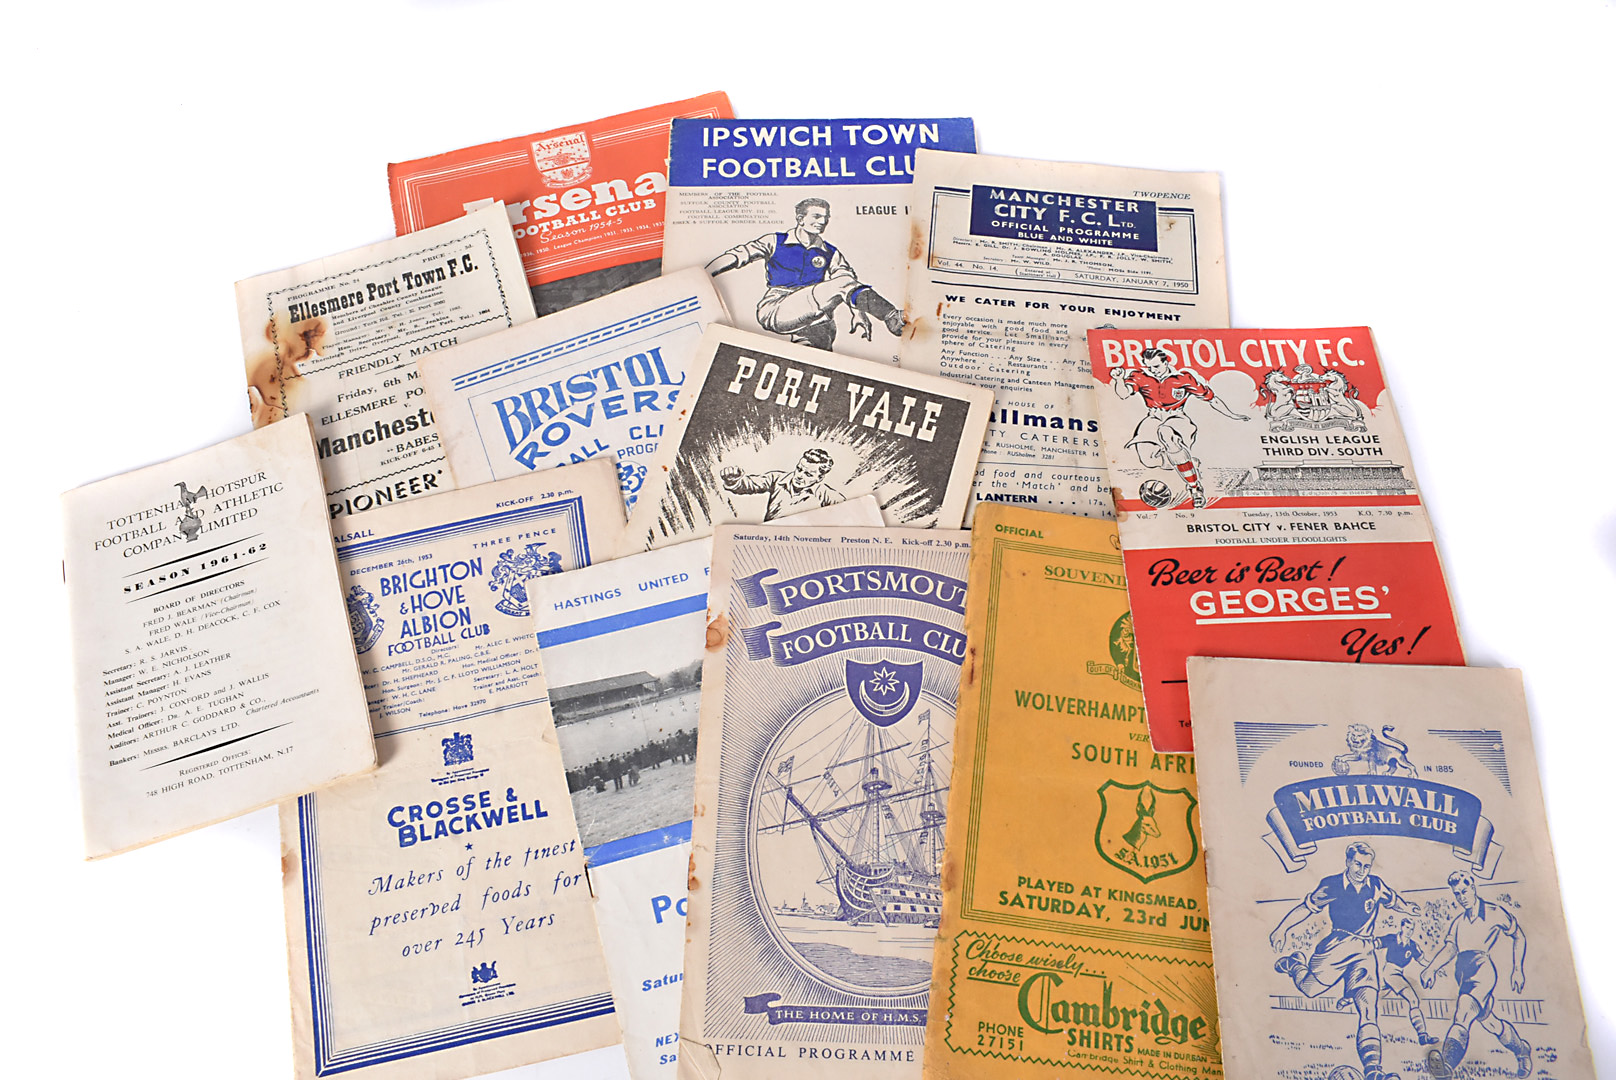 Football Programmes plus, approximately thirty football programmes generally from the 1950s that